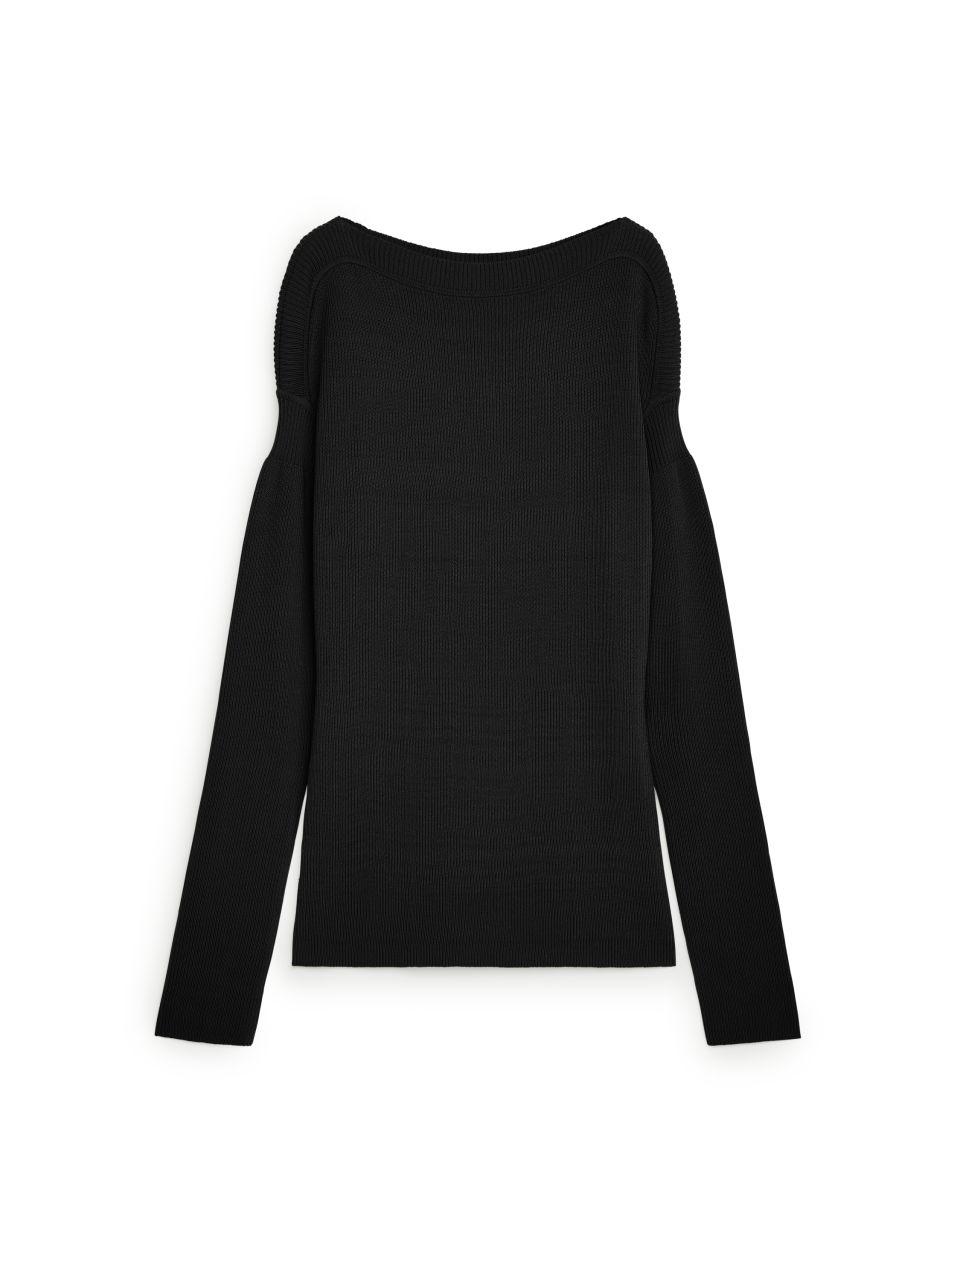 Puff Sleeve Jumper - Black